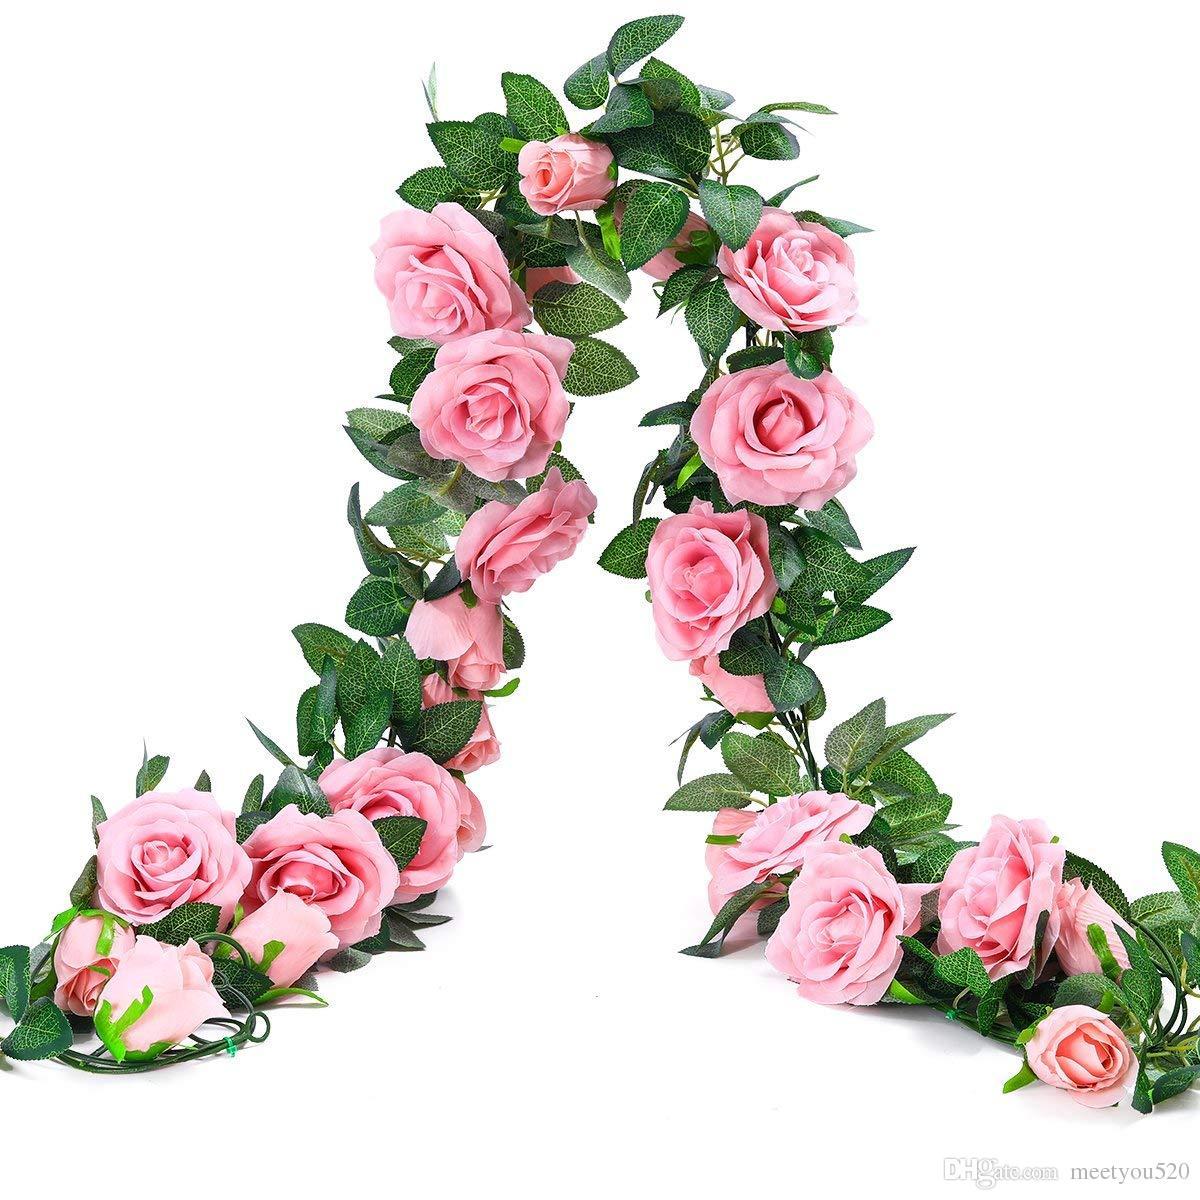 2018 65ft Artificial Rose Vine Silk Flower Garland Hanging Baskets